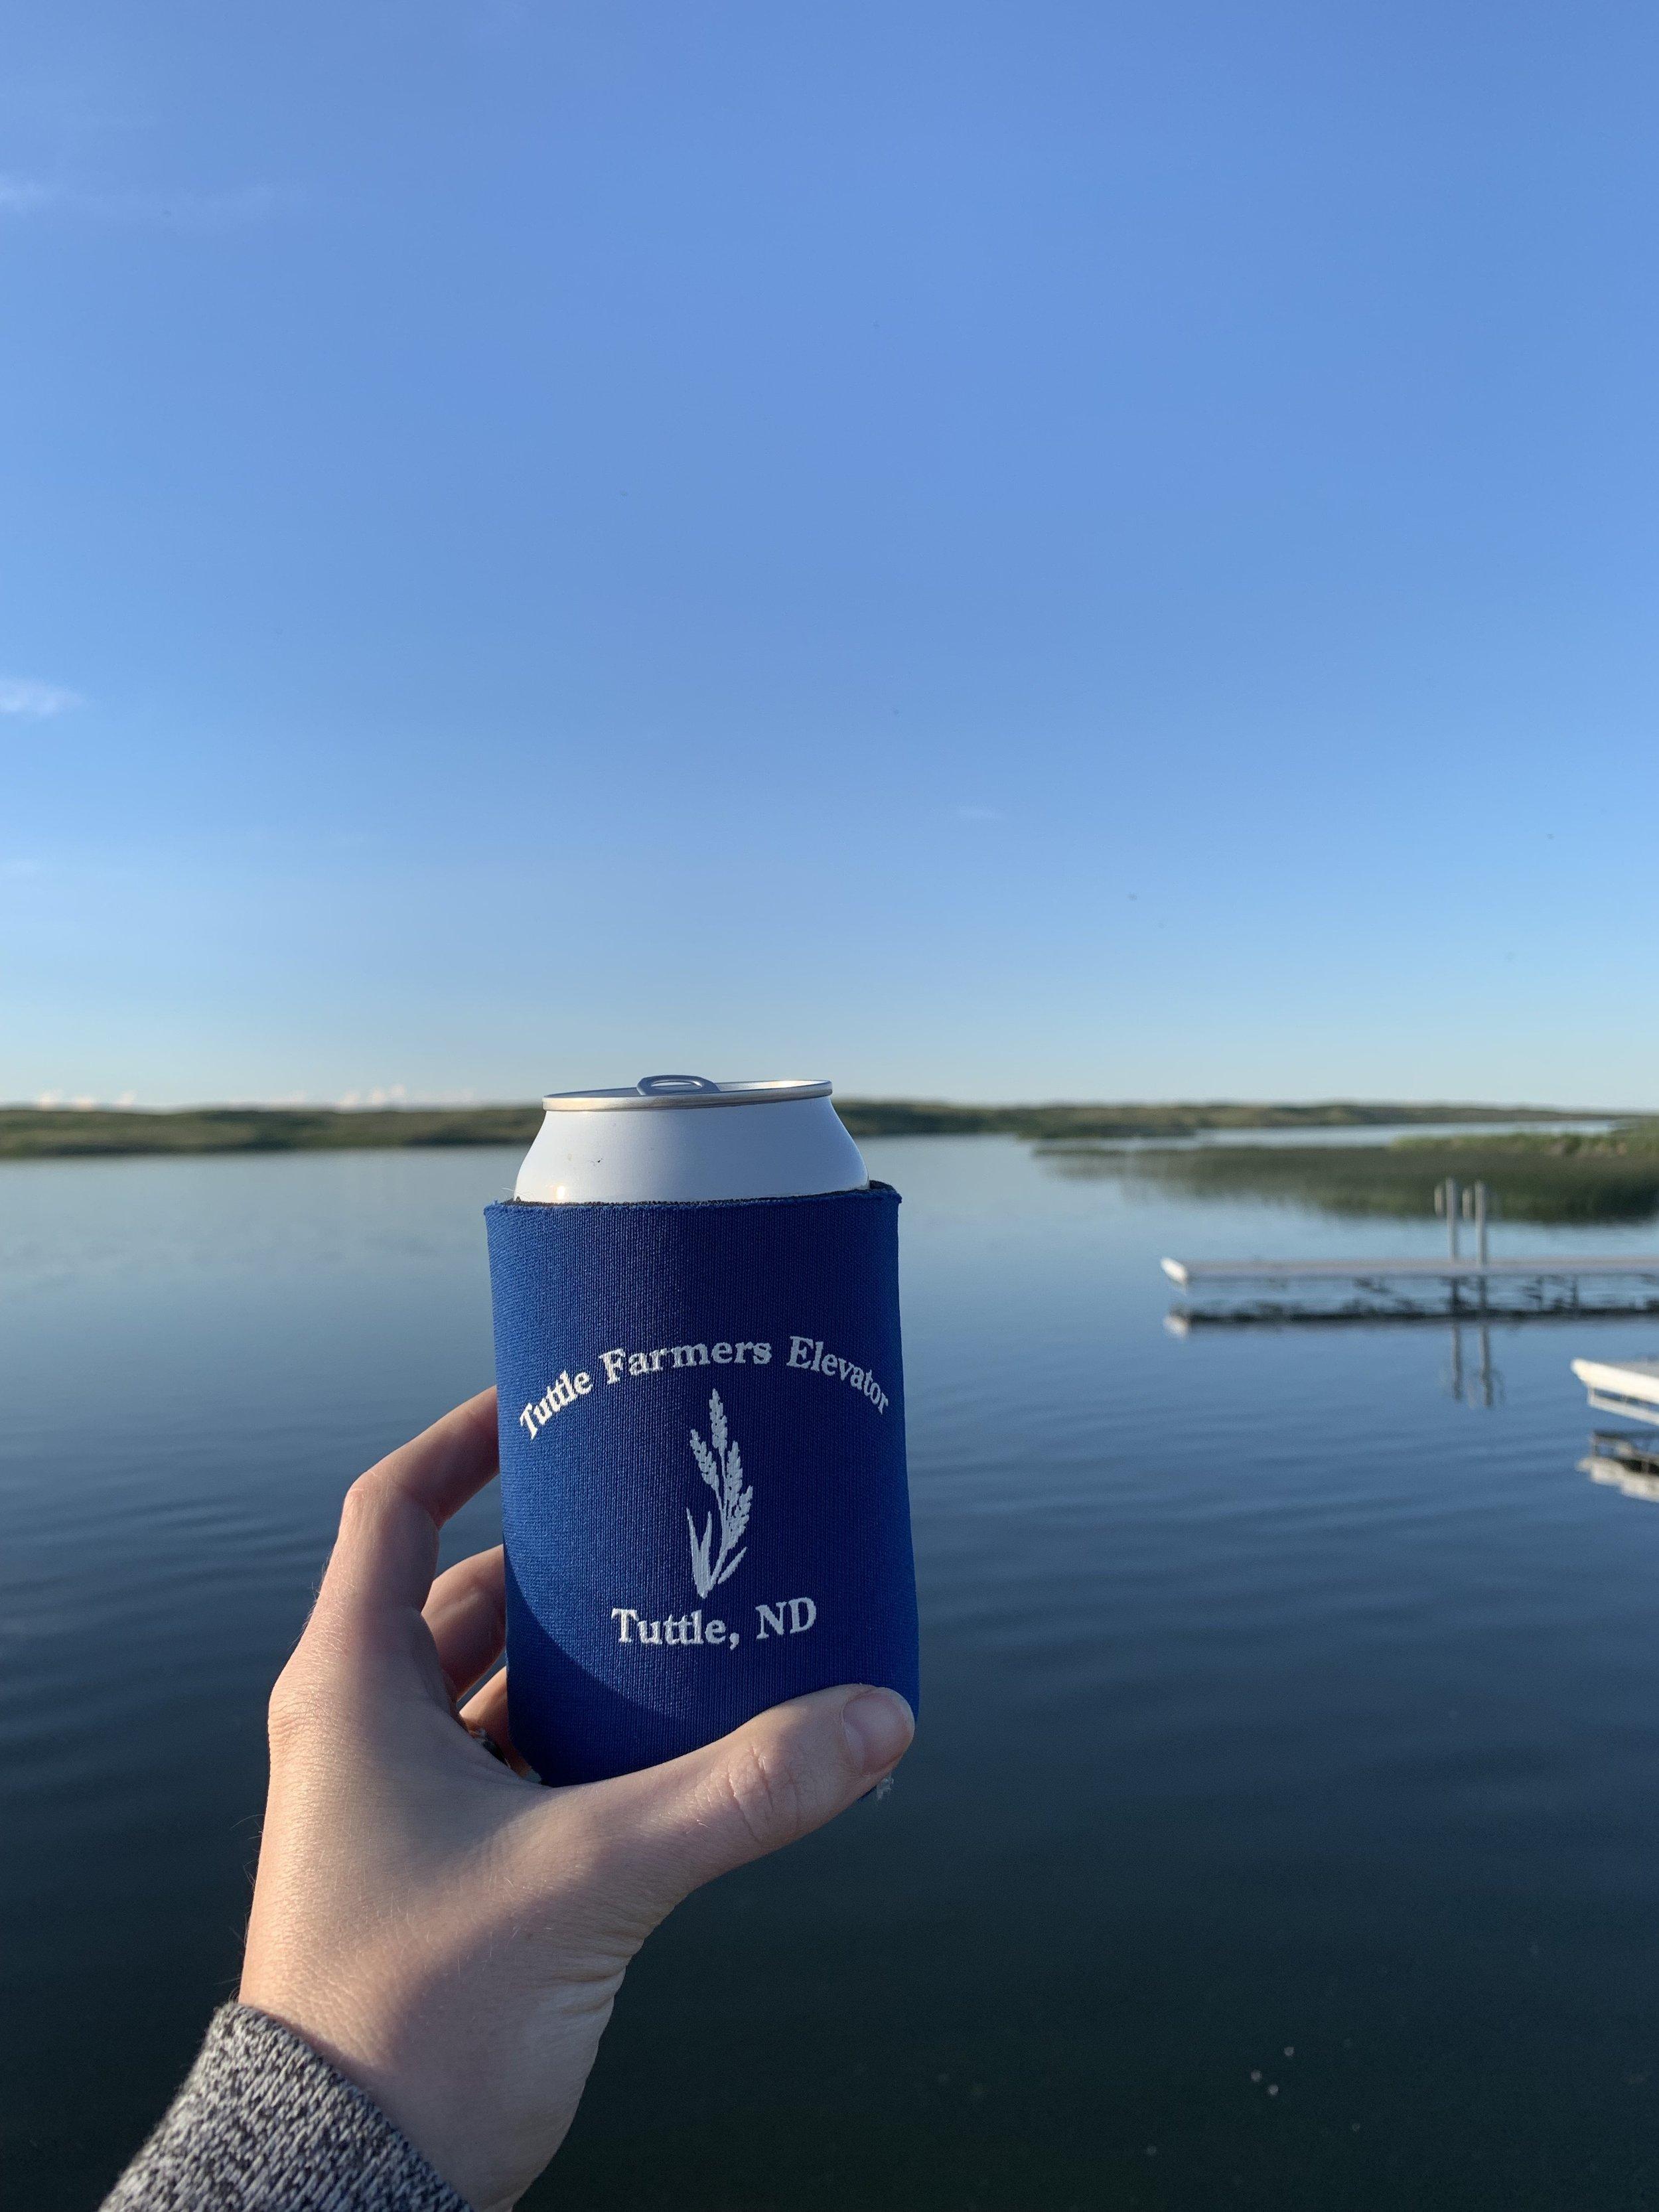 Lake Josephine, outside of Tuttle, North Dakota